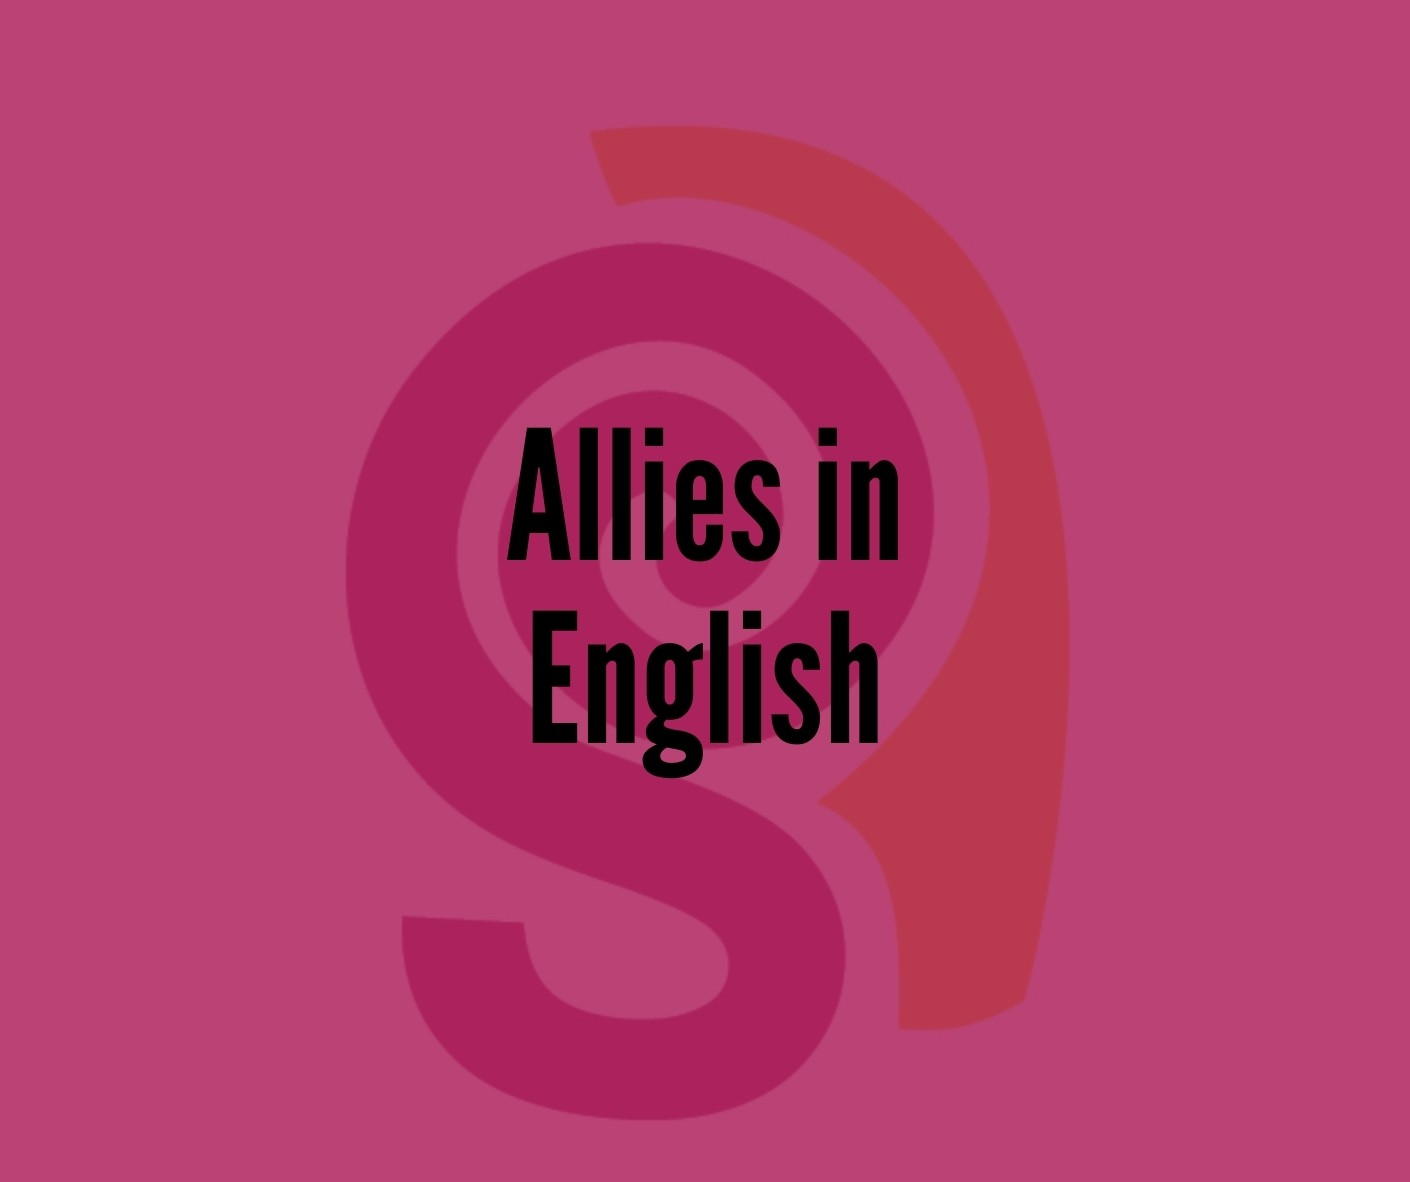 Allies in English